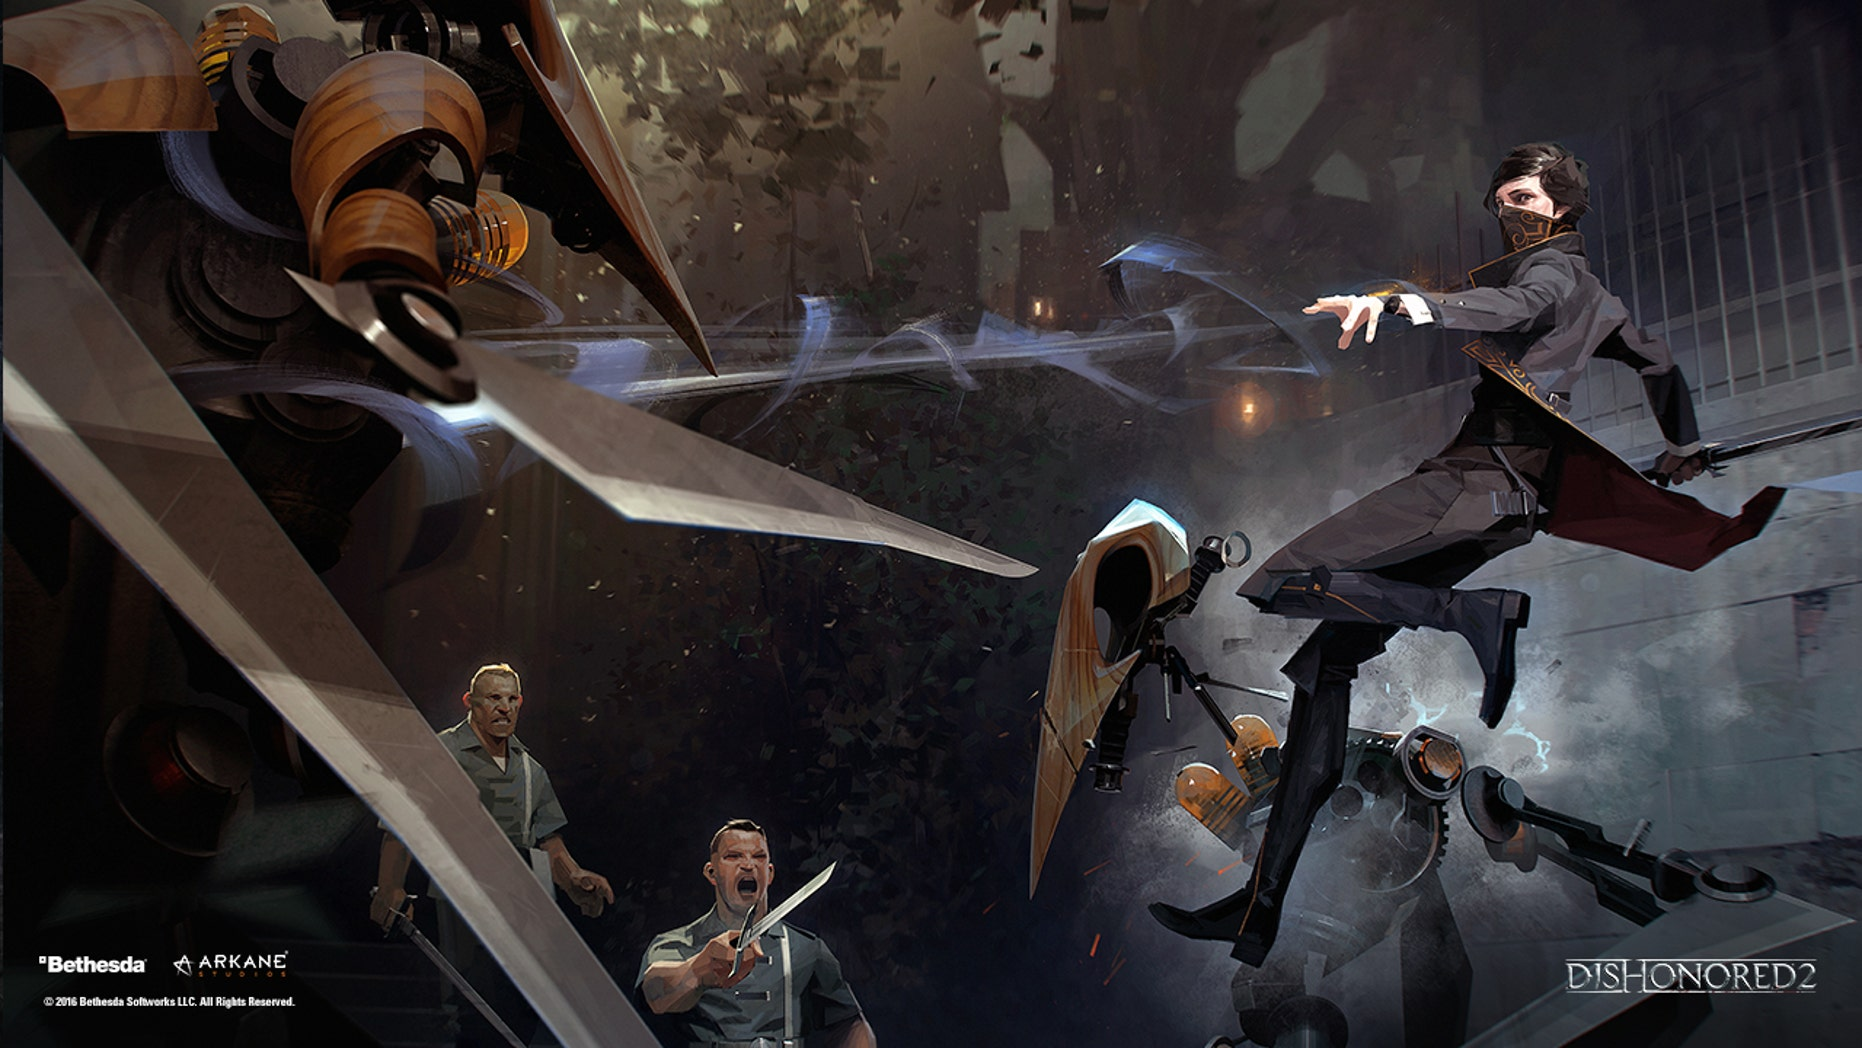 """Dishonored 2"" screenshot (Bethesda Softworks/Arkane Studios)."